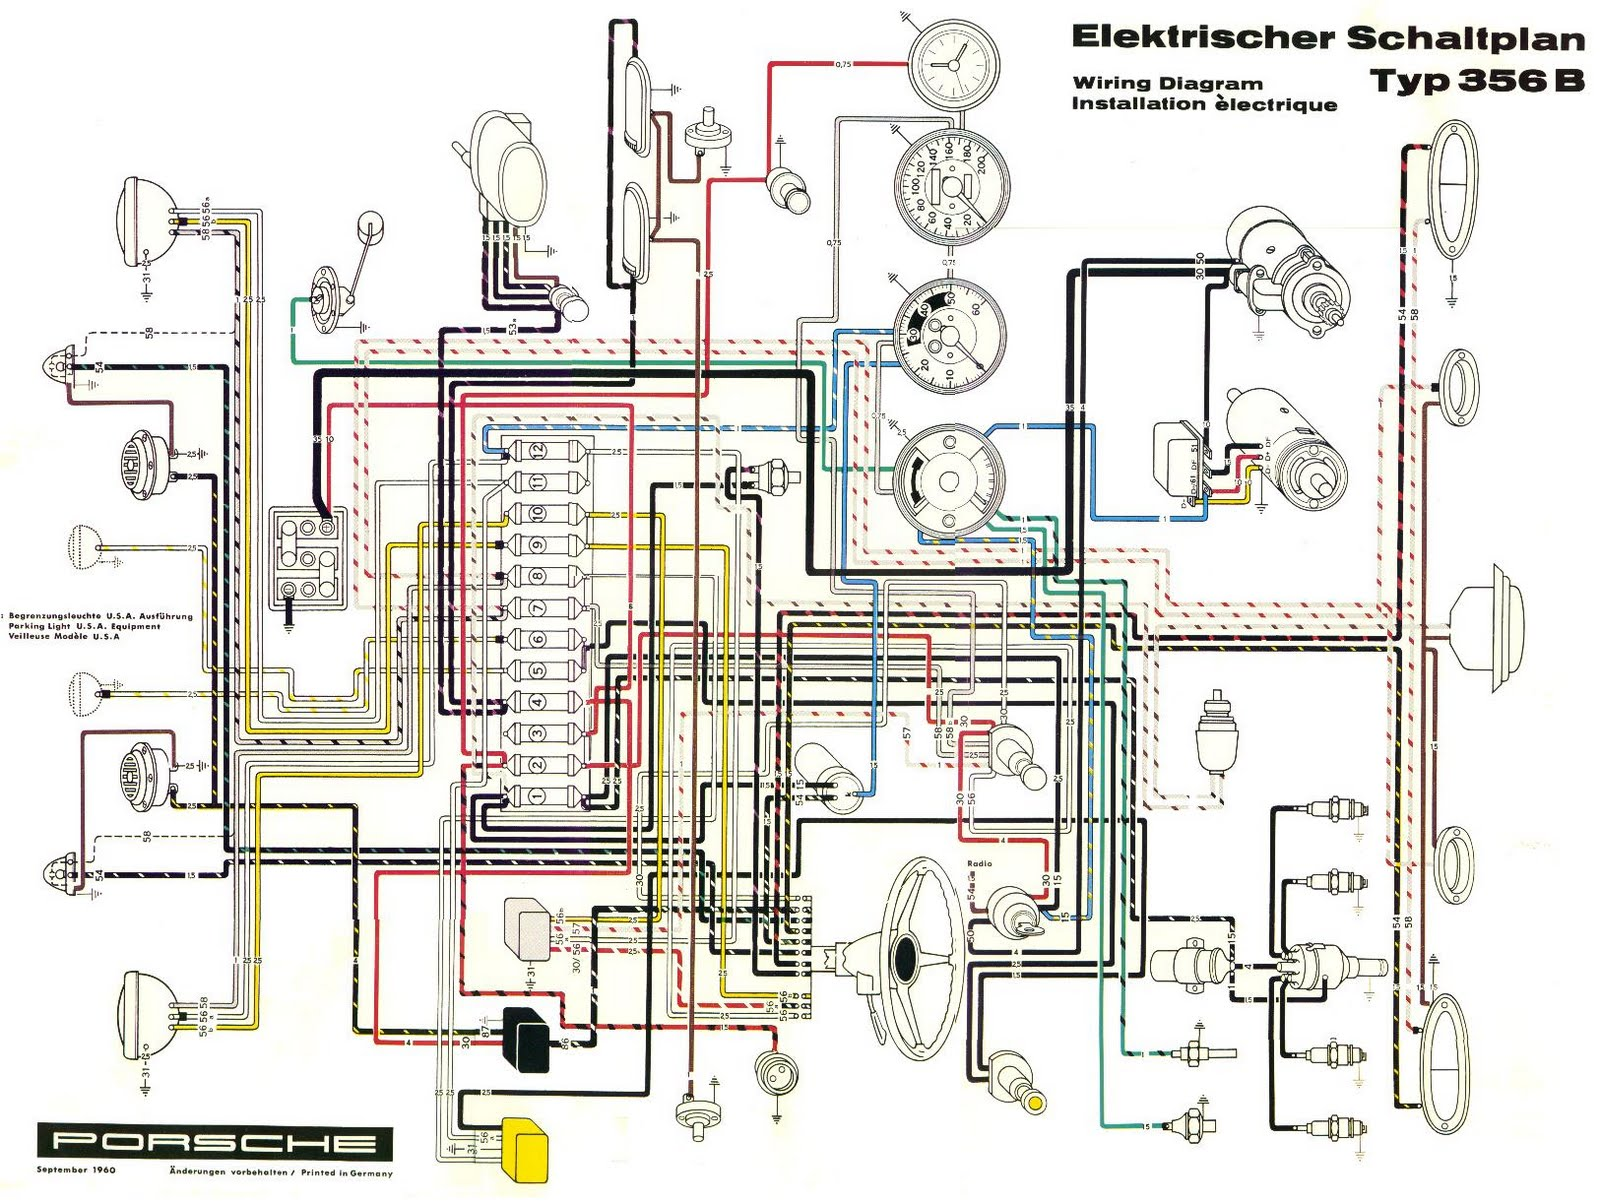 Peugeot Boxer Wiring Diagram Pdf Diagrams Trailer 3 Library Rh 91 Evitta De Rockville Amp